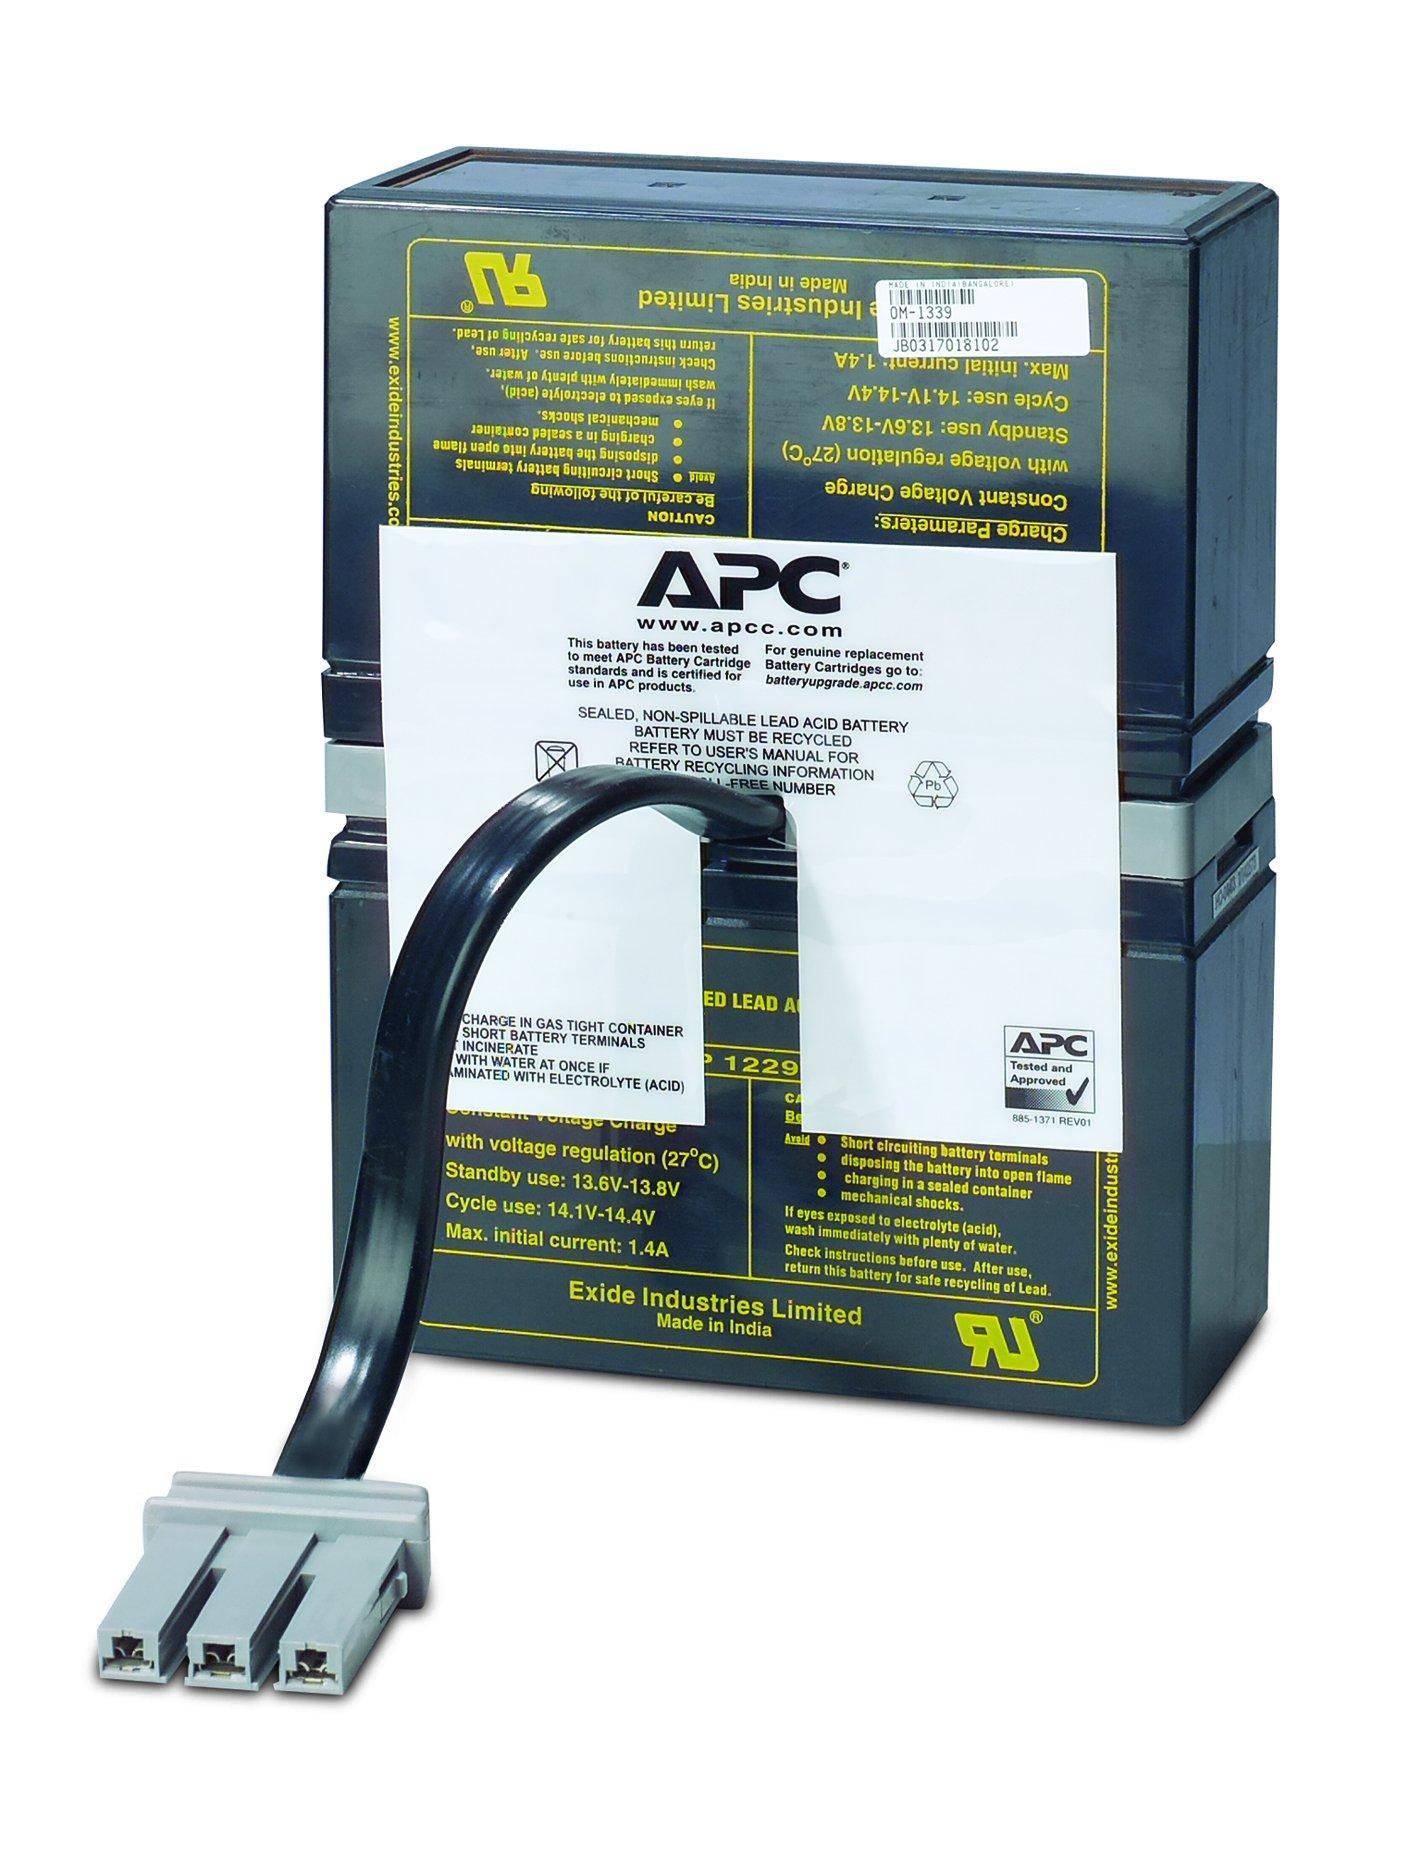 Apc Rbc32 Battery Wiring Diagram Library Lead Acid Schematic Diagramsapc Mitsubishi